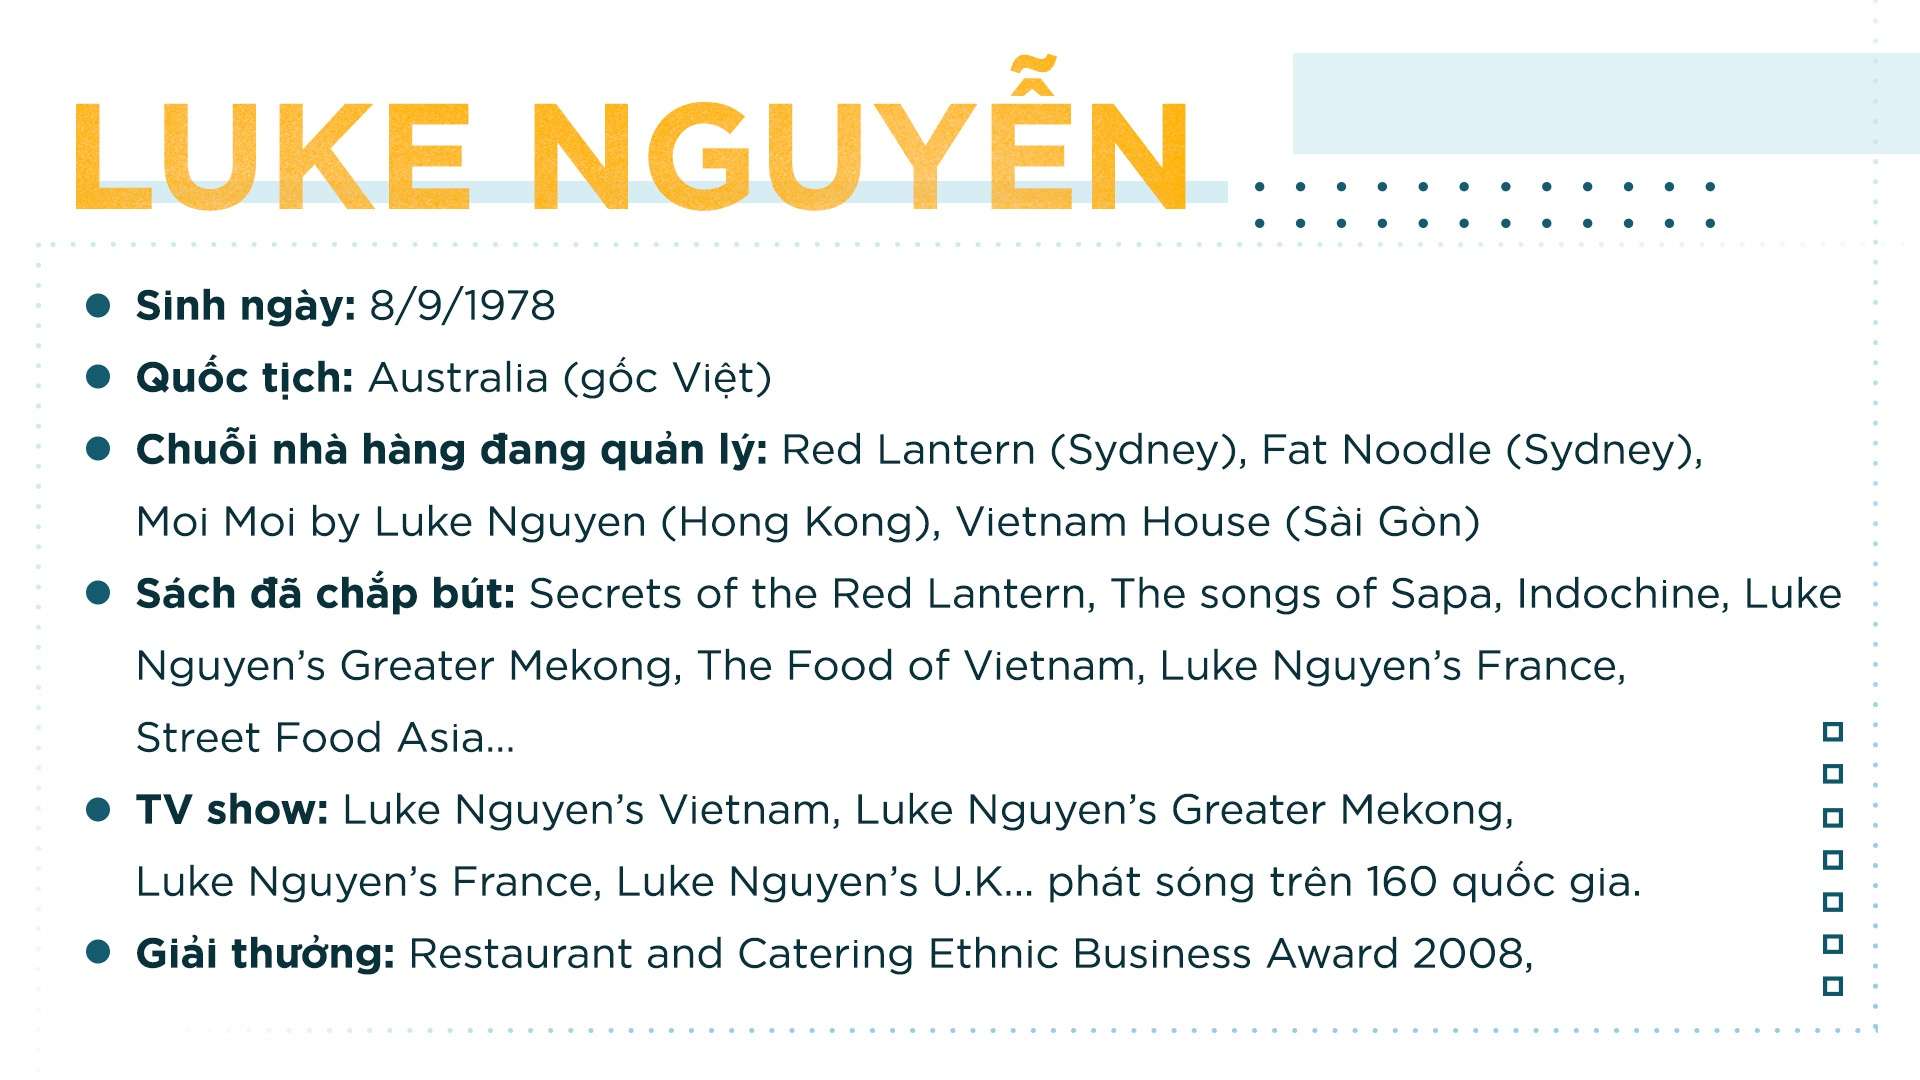 Luke Nguyen va du dinh nang tam am thuc Viet tren moi chuyen bay 4 sao hinh anh 4